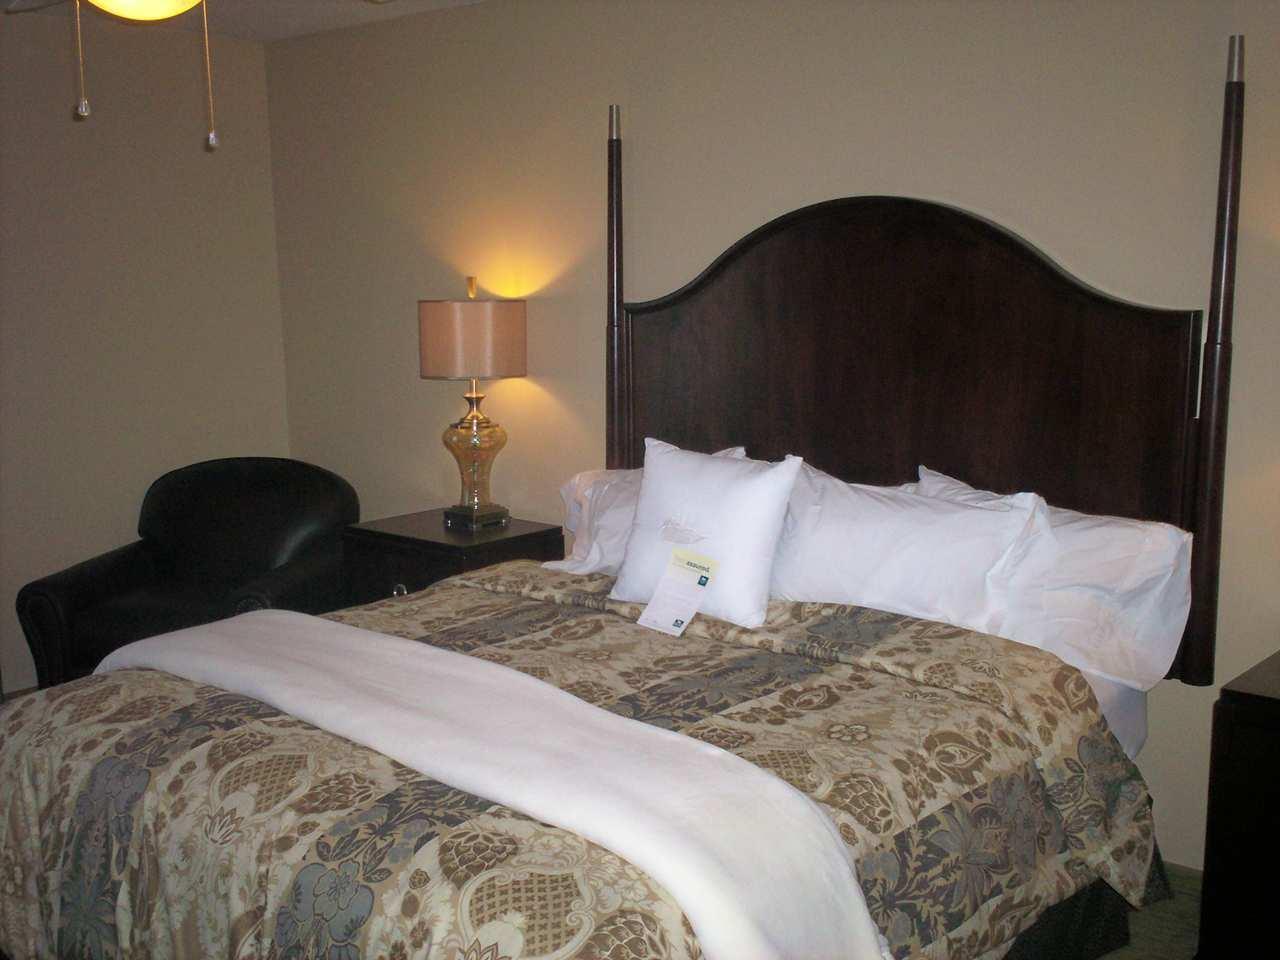 Homewood Suites by Hilton Albuquerque Airport image 4